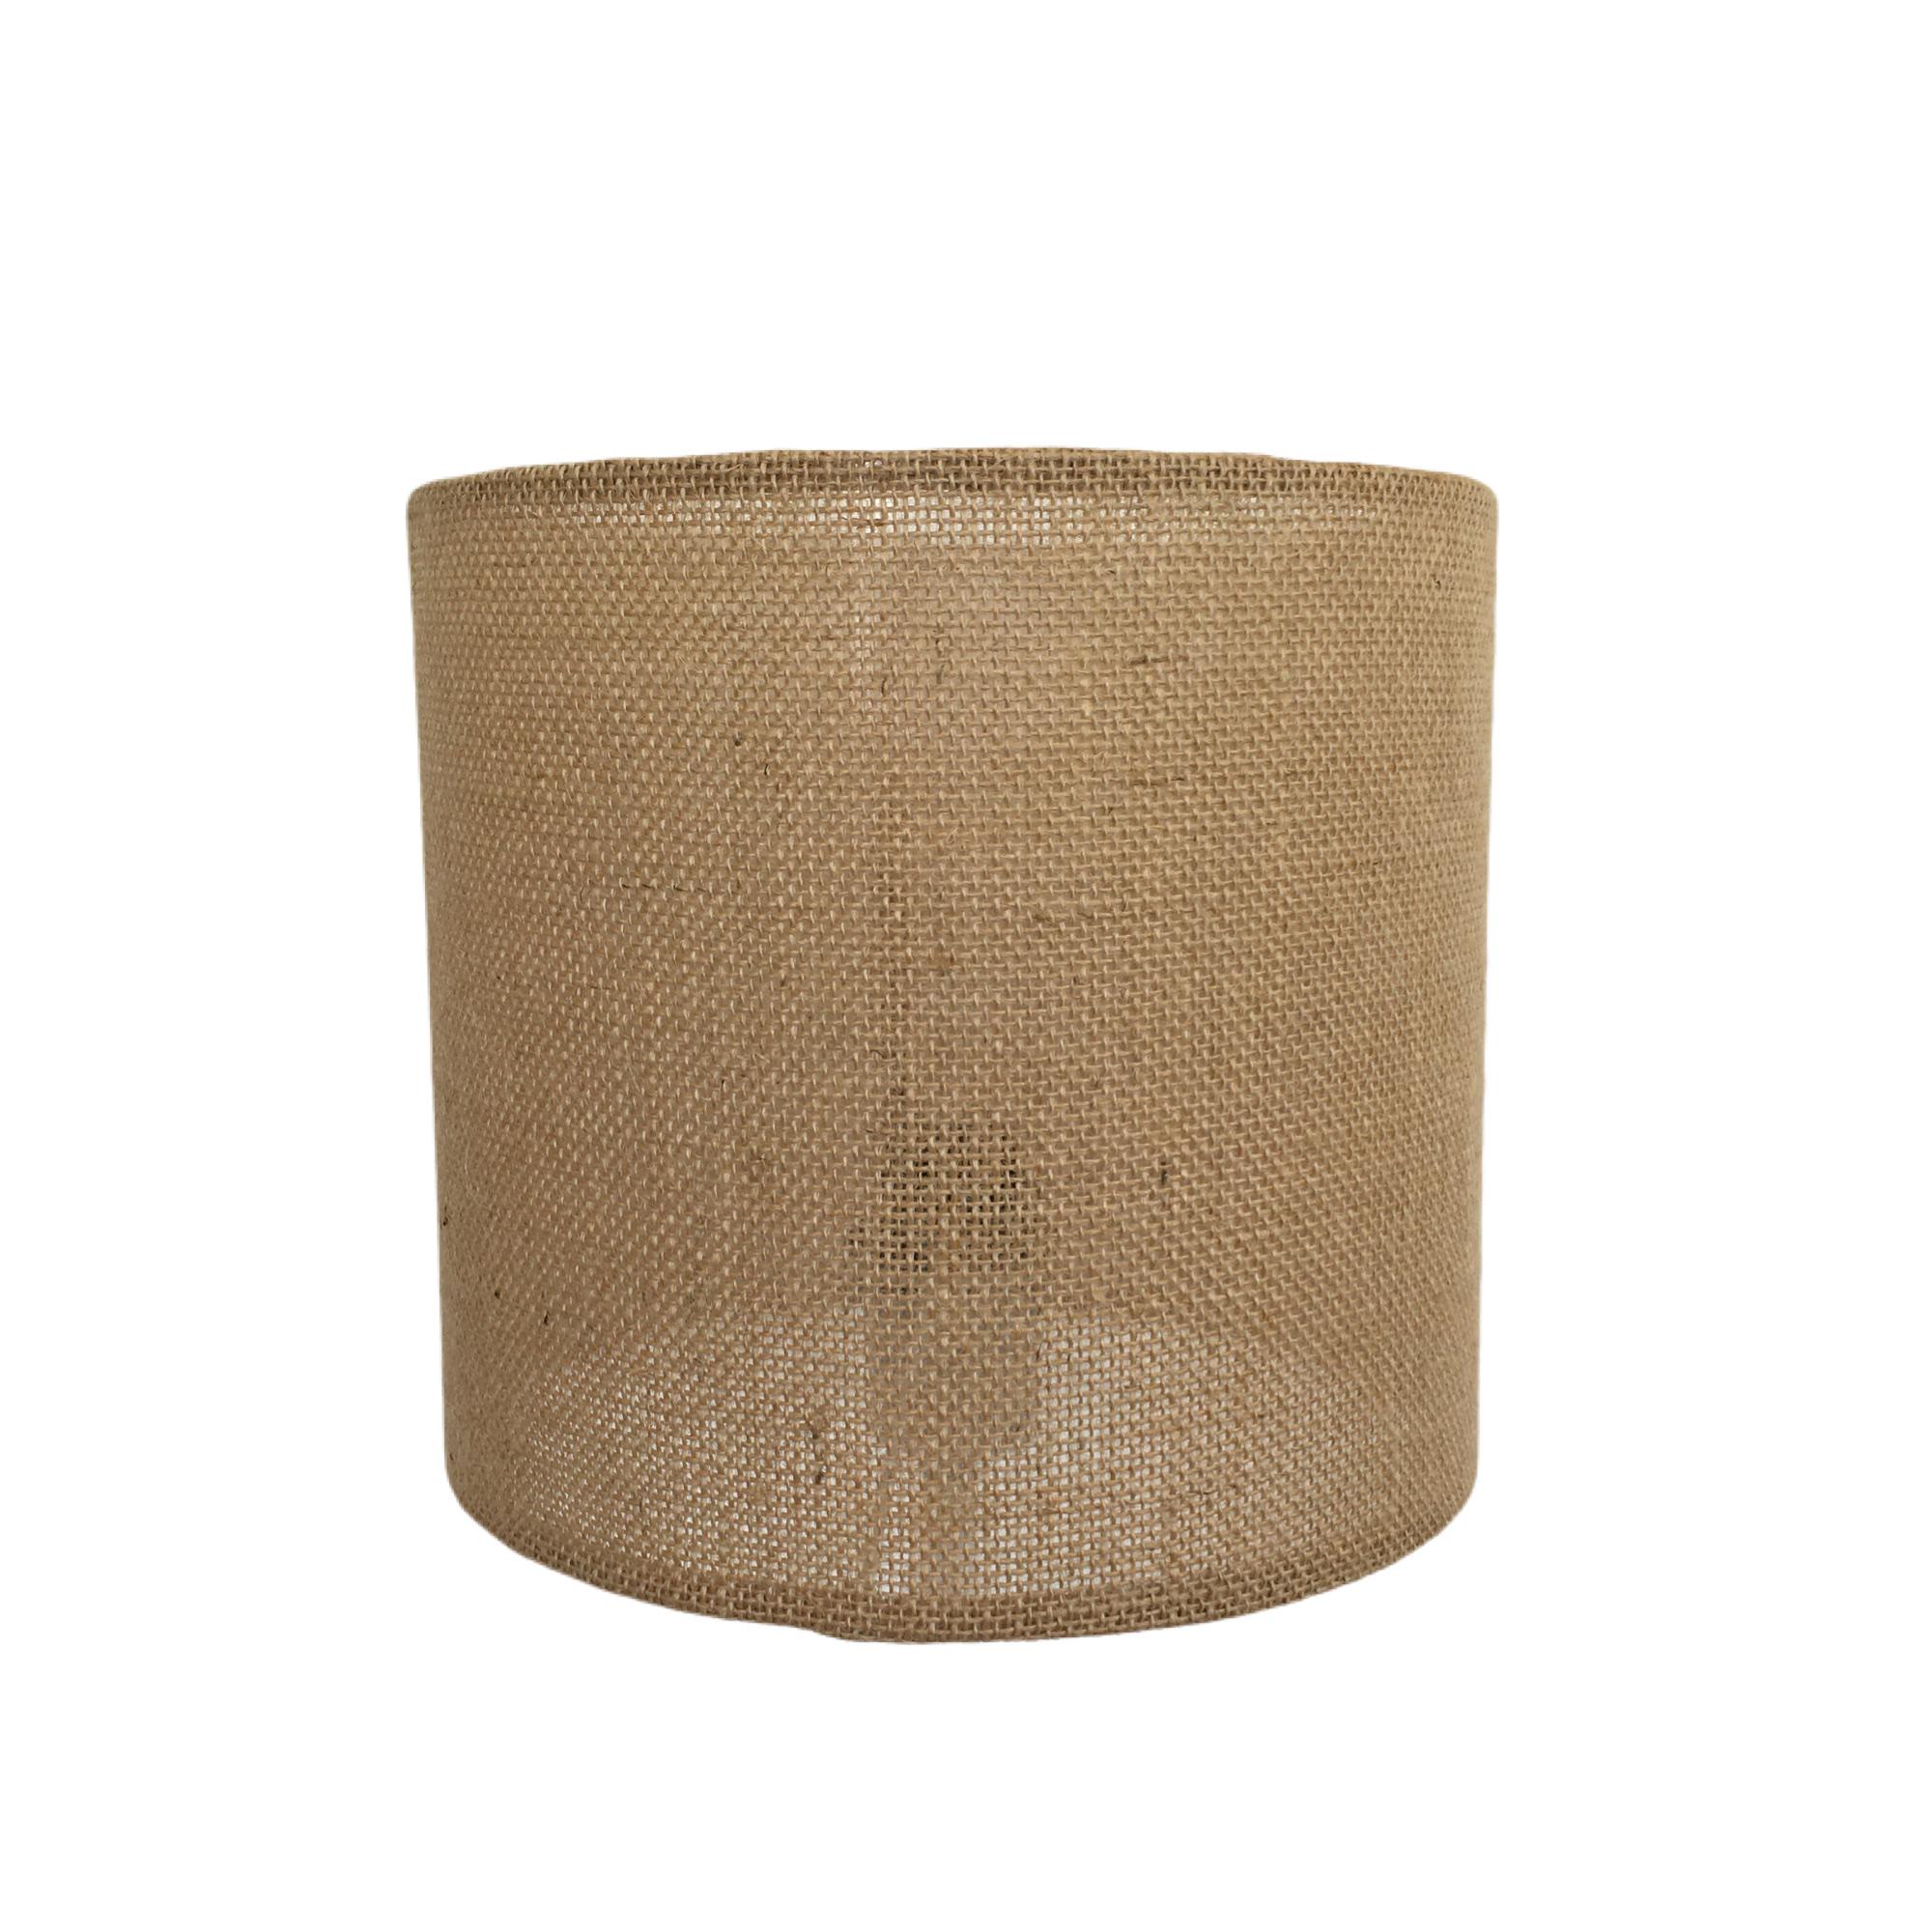 Suspension toile de jute diamètre 50 cm